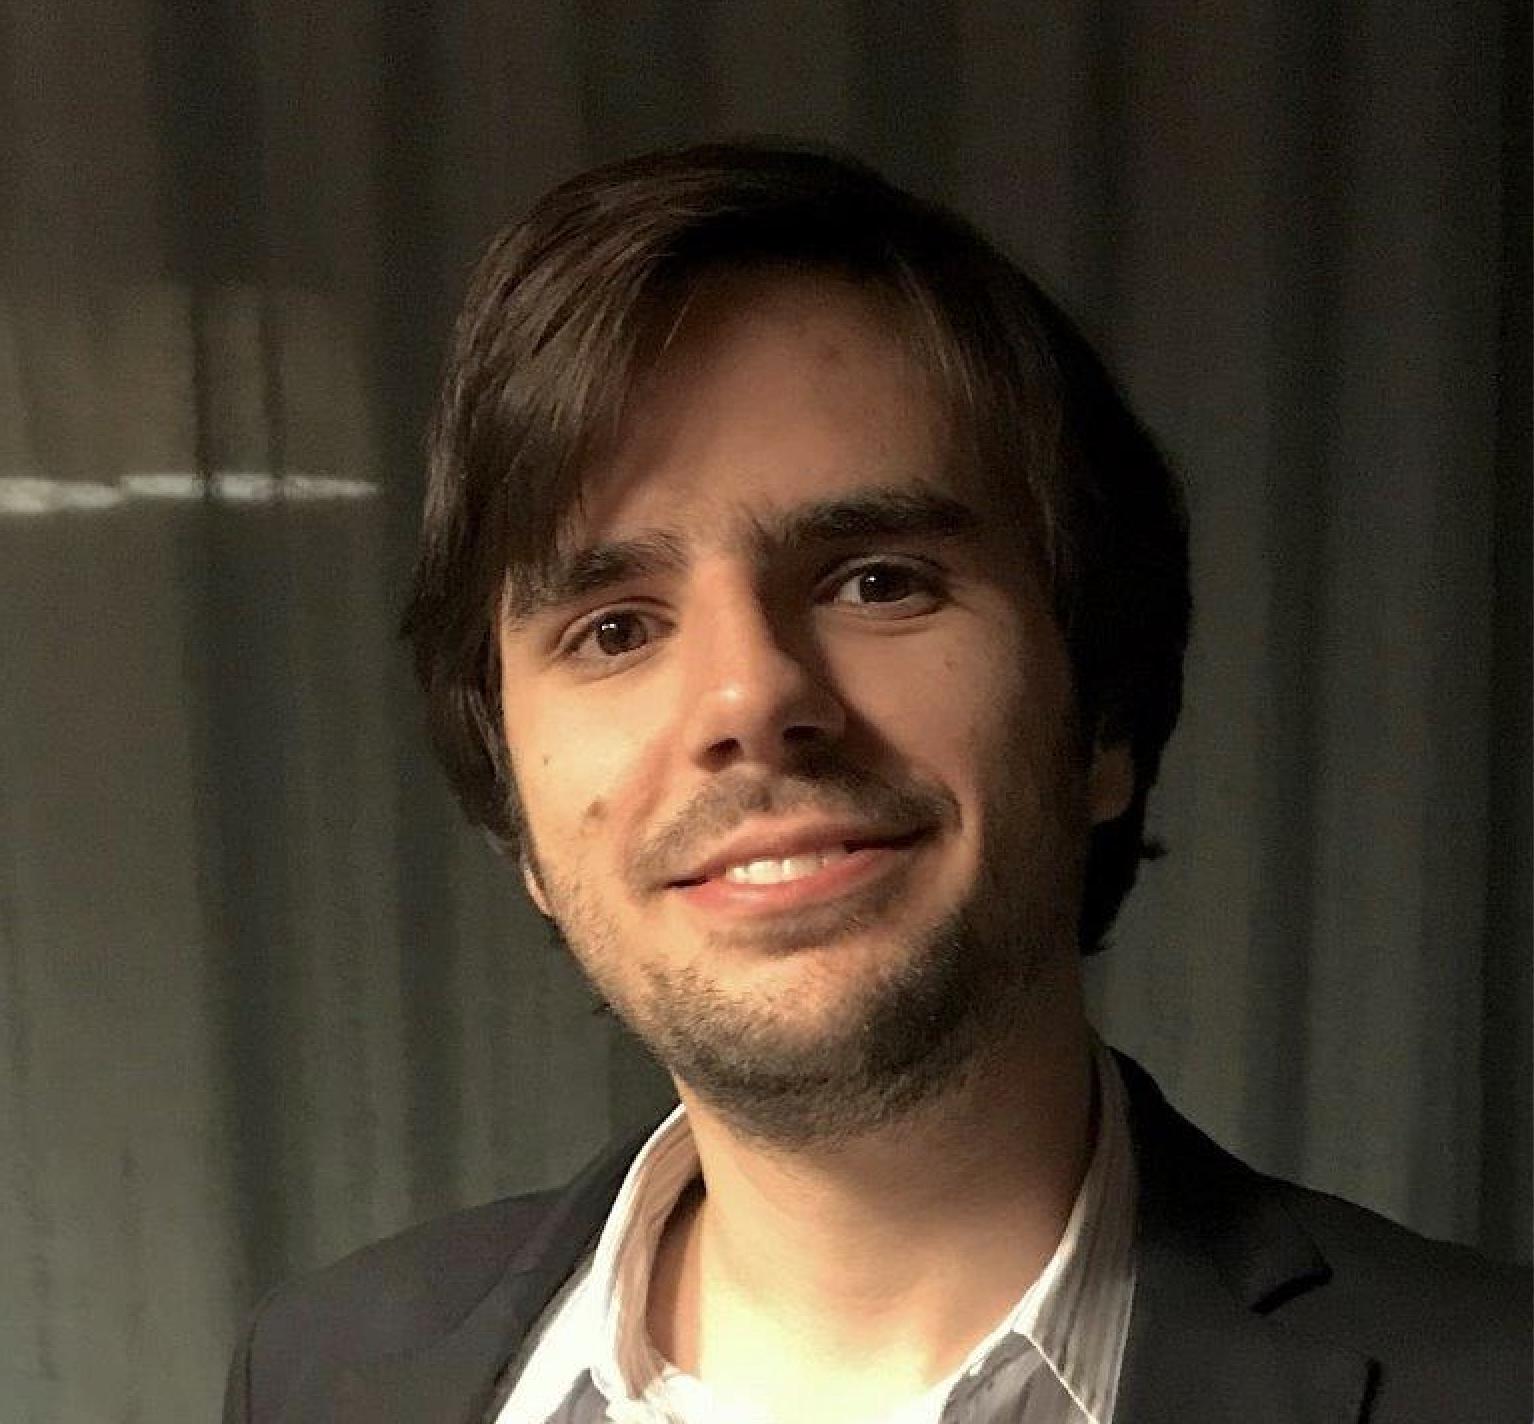 Gabriele Gaetano Fronzè